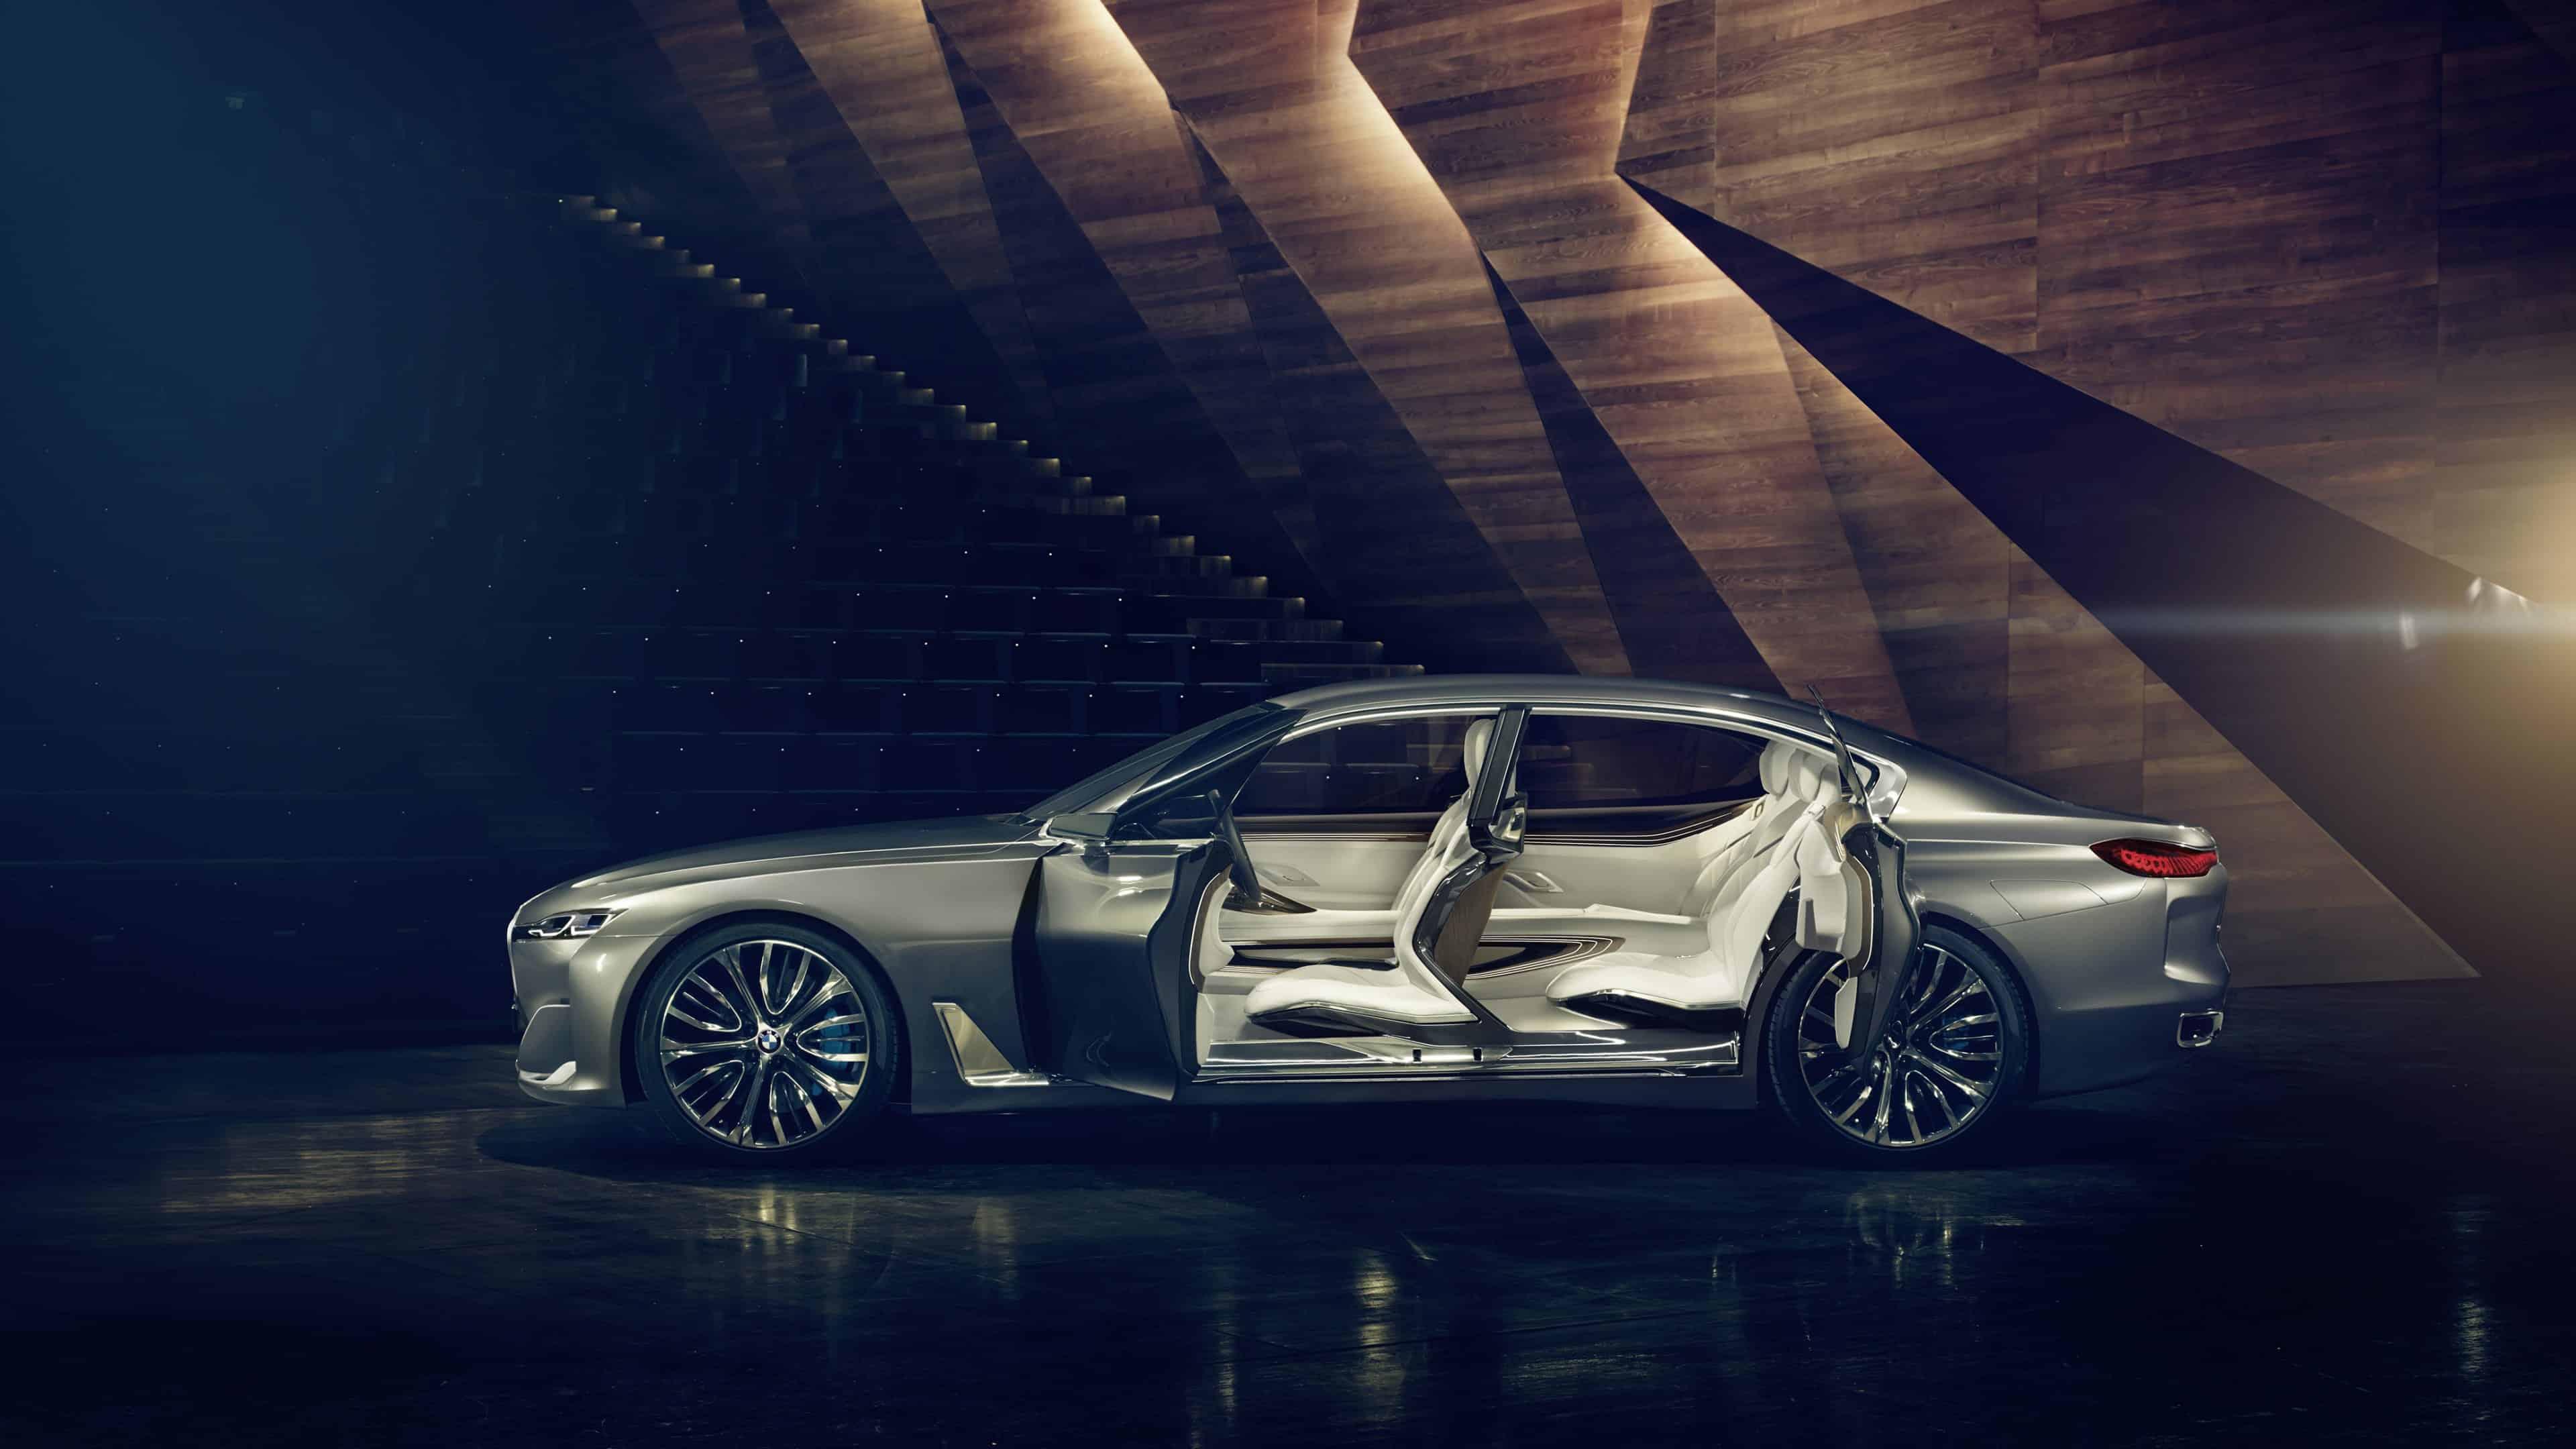 bmw pininfarina gran lusso coupe concept uhd 4k wallpaper